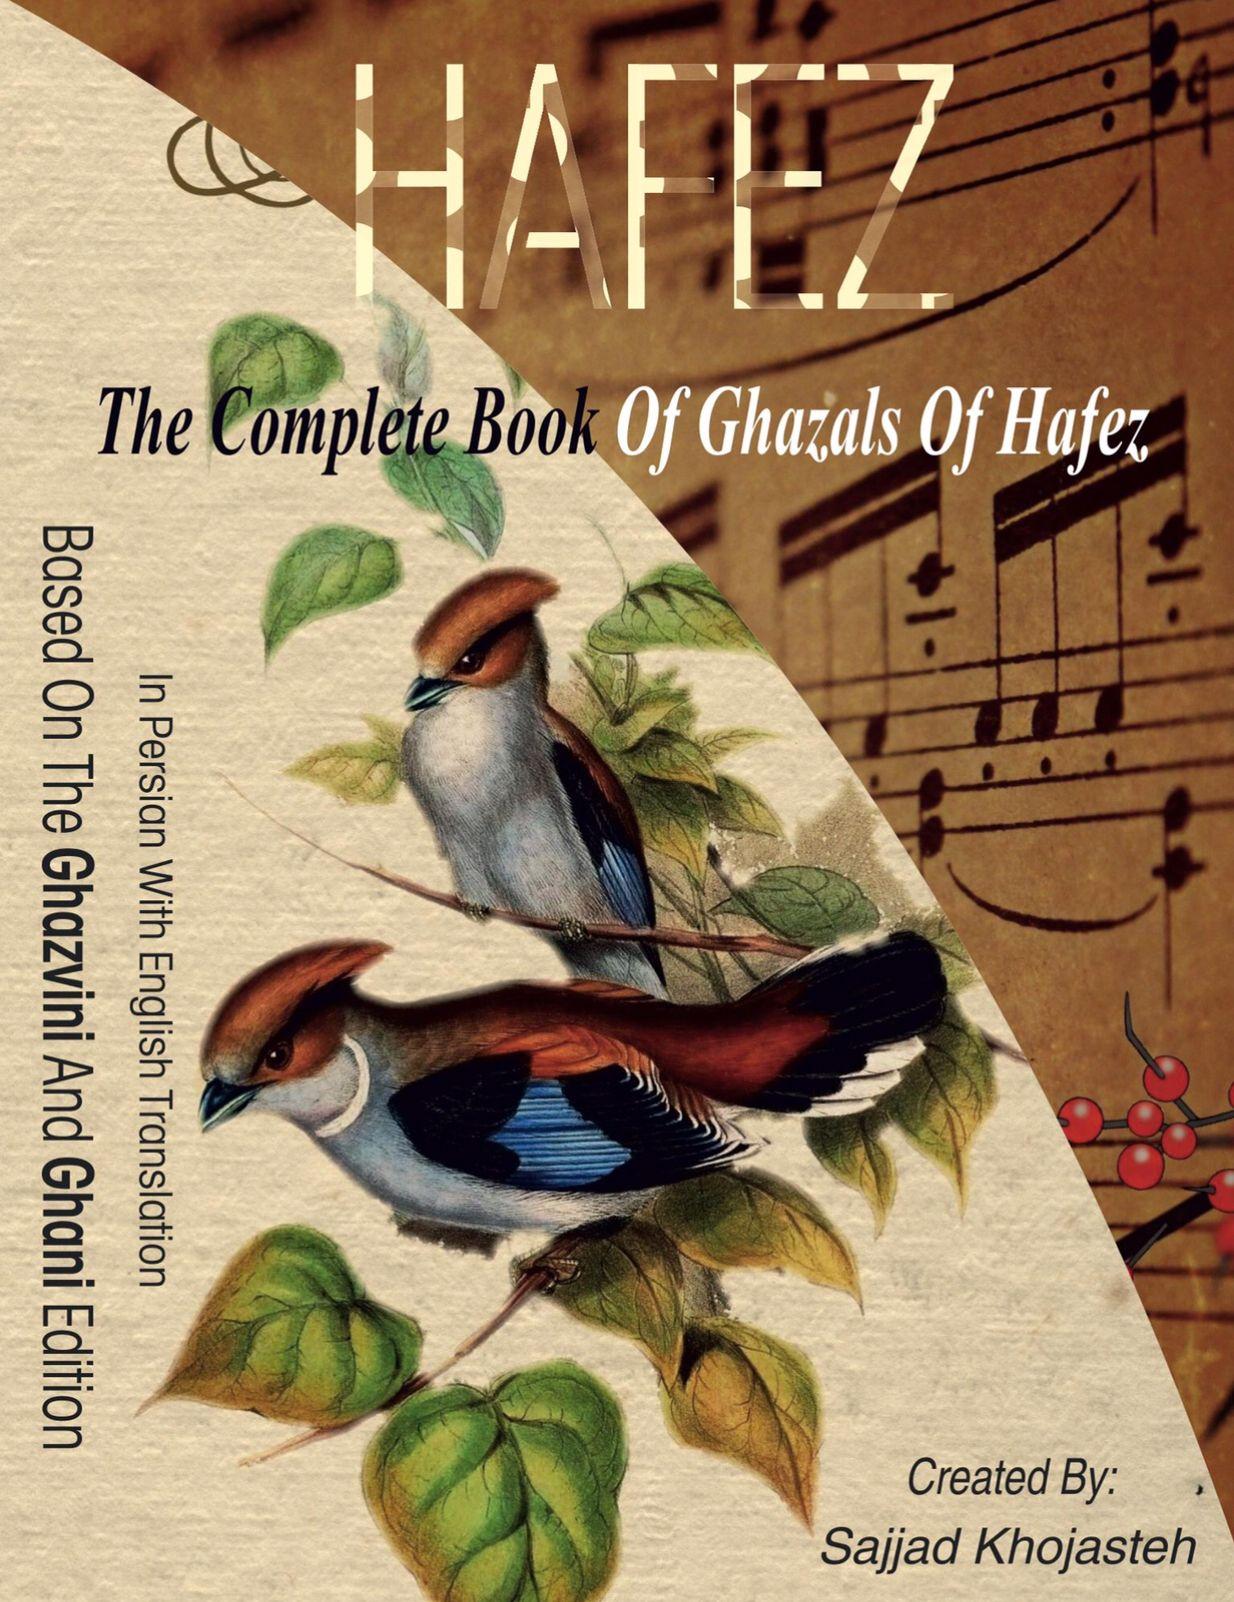 Pin By Farsibooks On Hafez Poems Hafez Books Hafez Poems